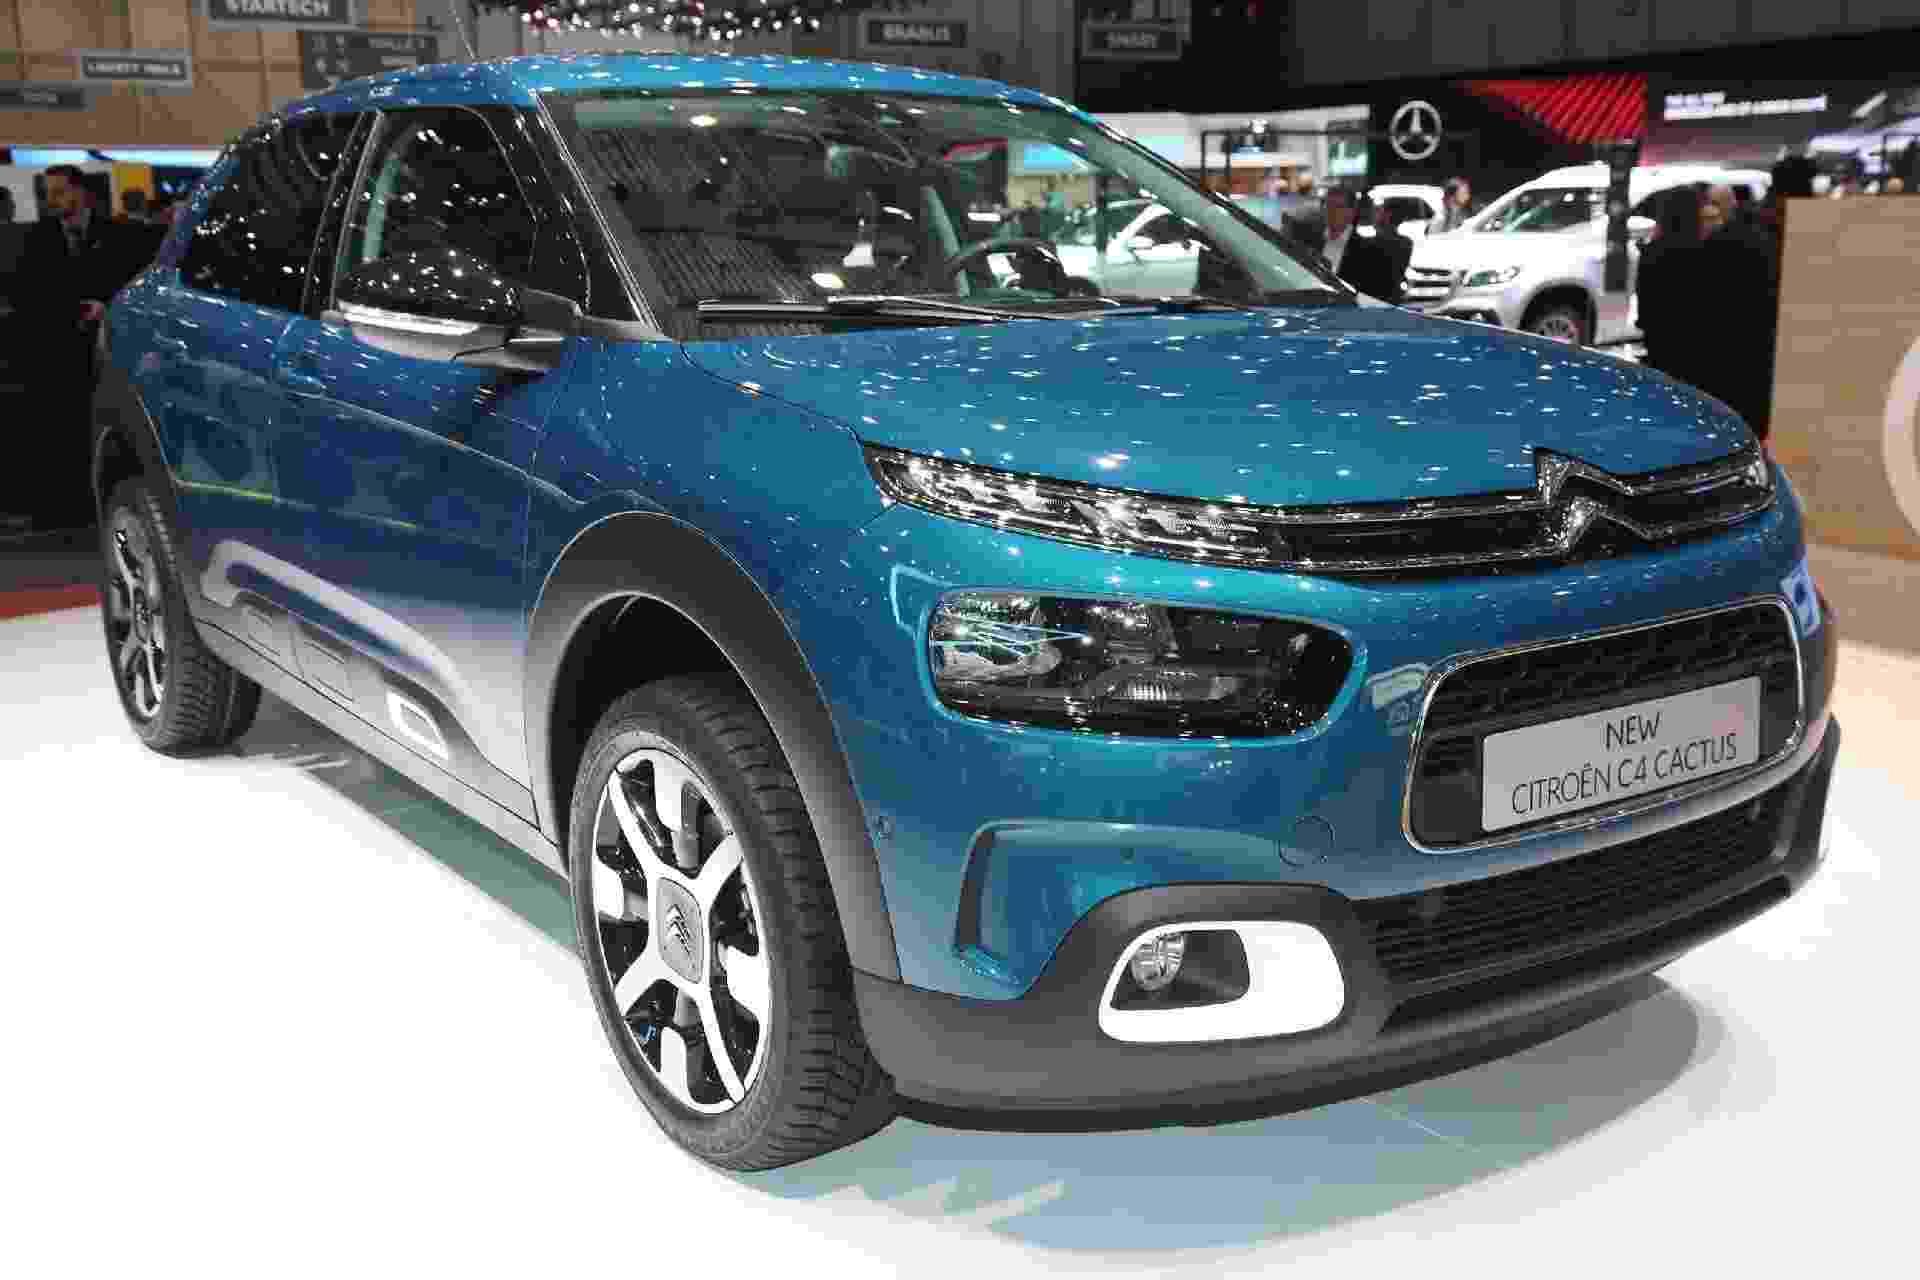 Citroën C4 Cactus 2018 - Newspress